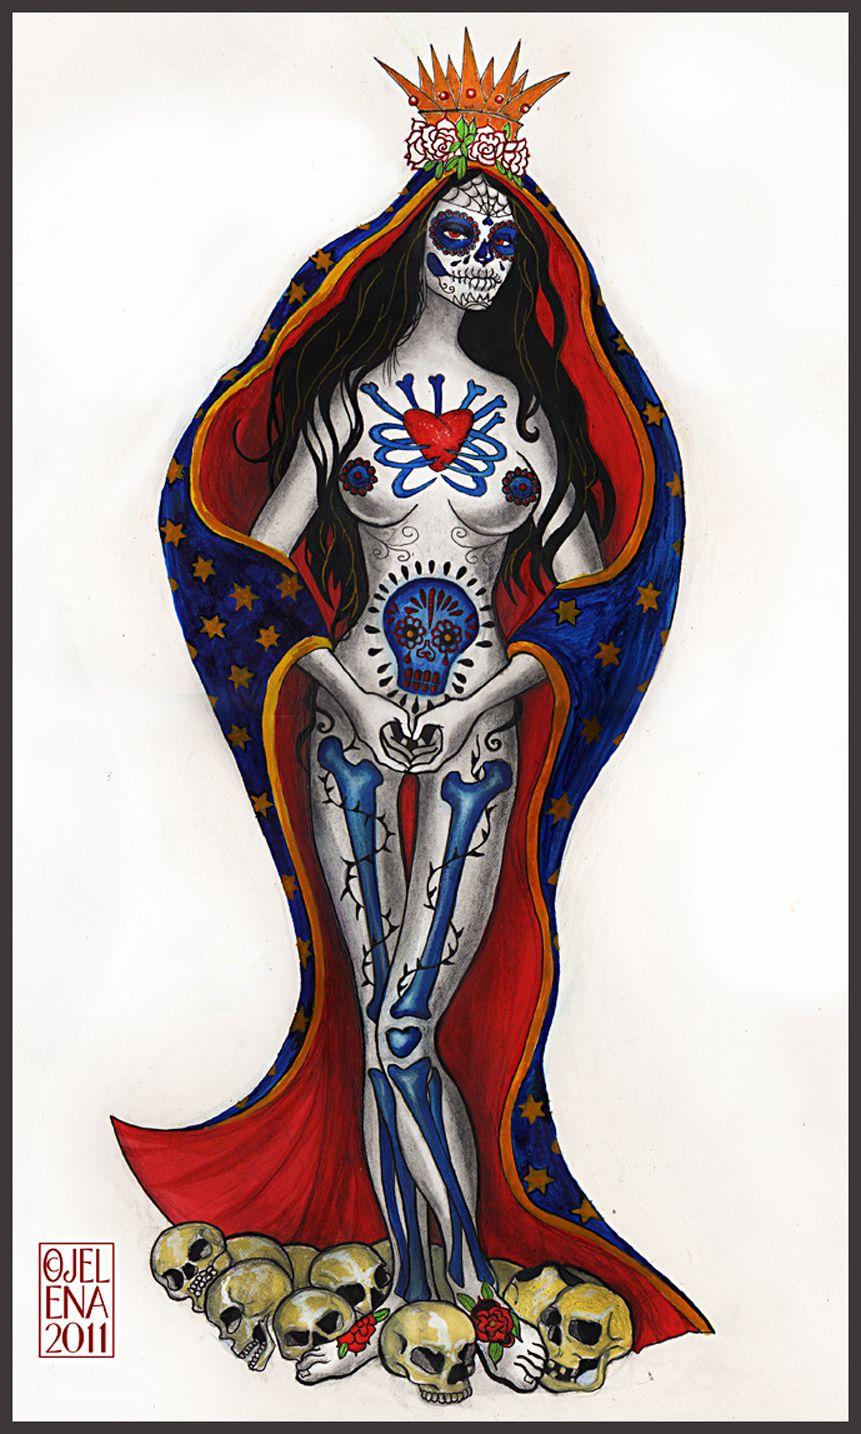 santa muerte pin up tattoo - Pesquisa Google  sc 1 st  Pinterest & santa muerte pin up tattoo - Pesquisa Google | Tatuajes | Pinterest ...